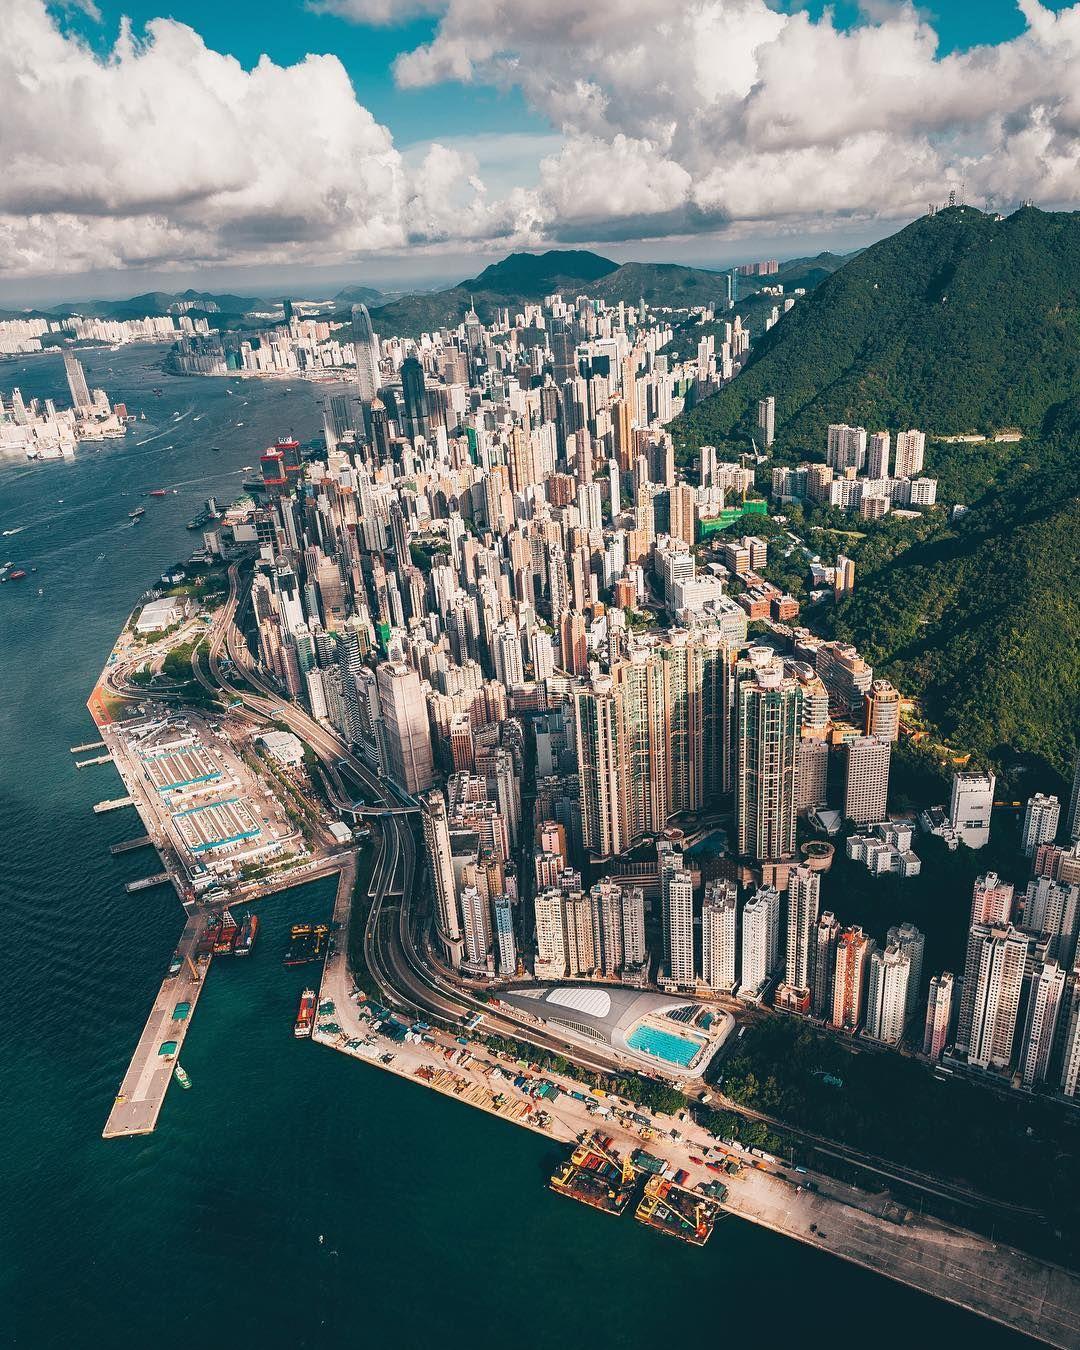 Https Www Instagram Com P Bfqjmgwnhha Taken By Edwardkb Hong Kong Travel Hong Kong Tourist Hong Kong Beaches